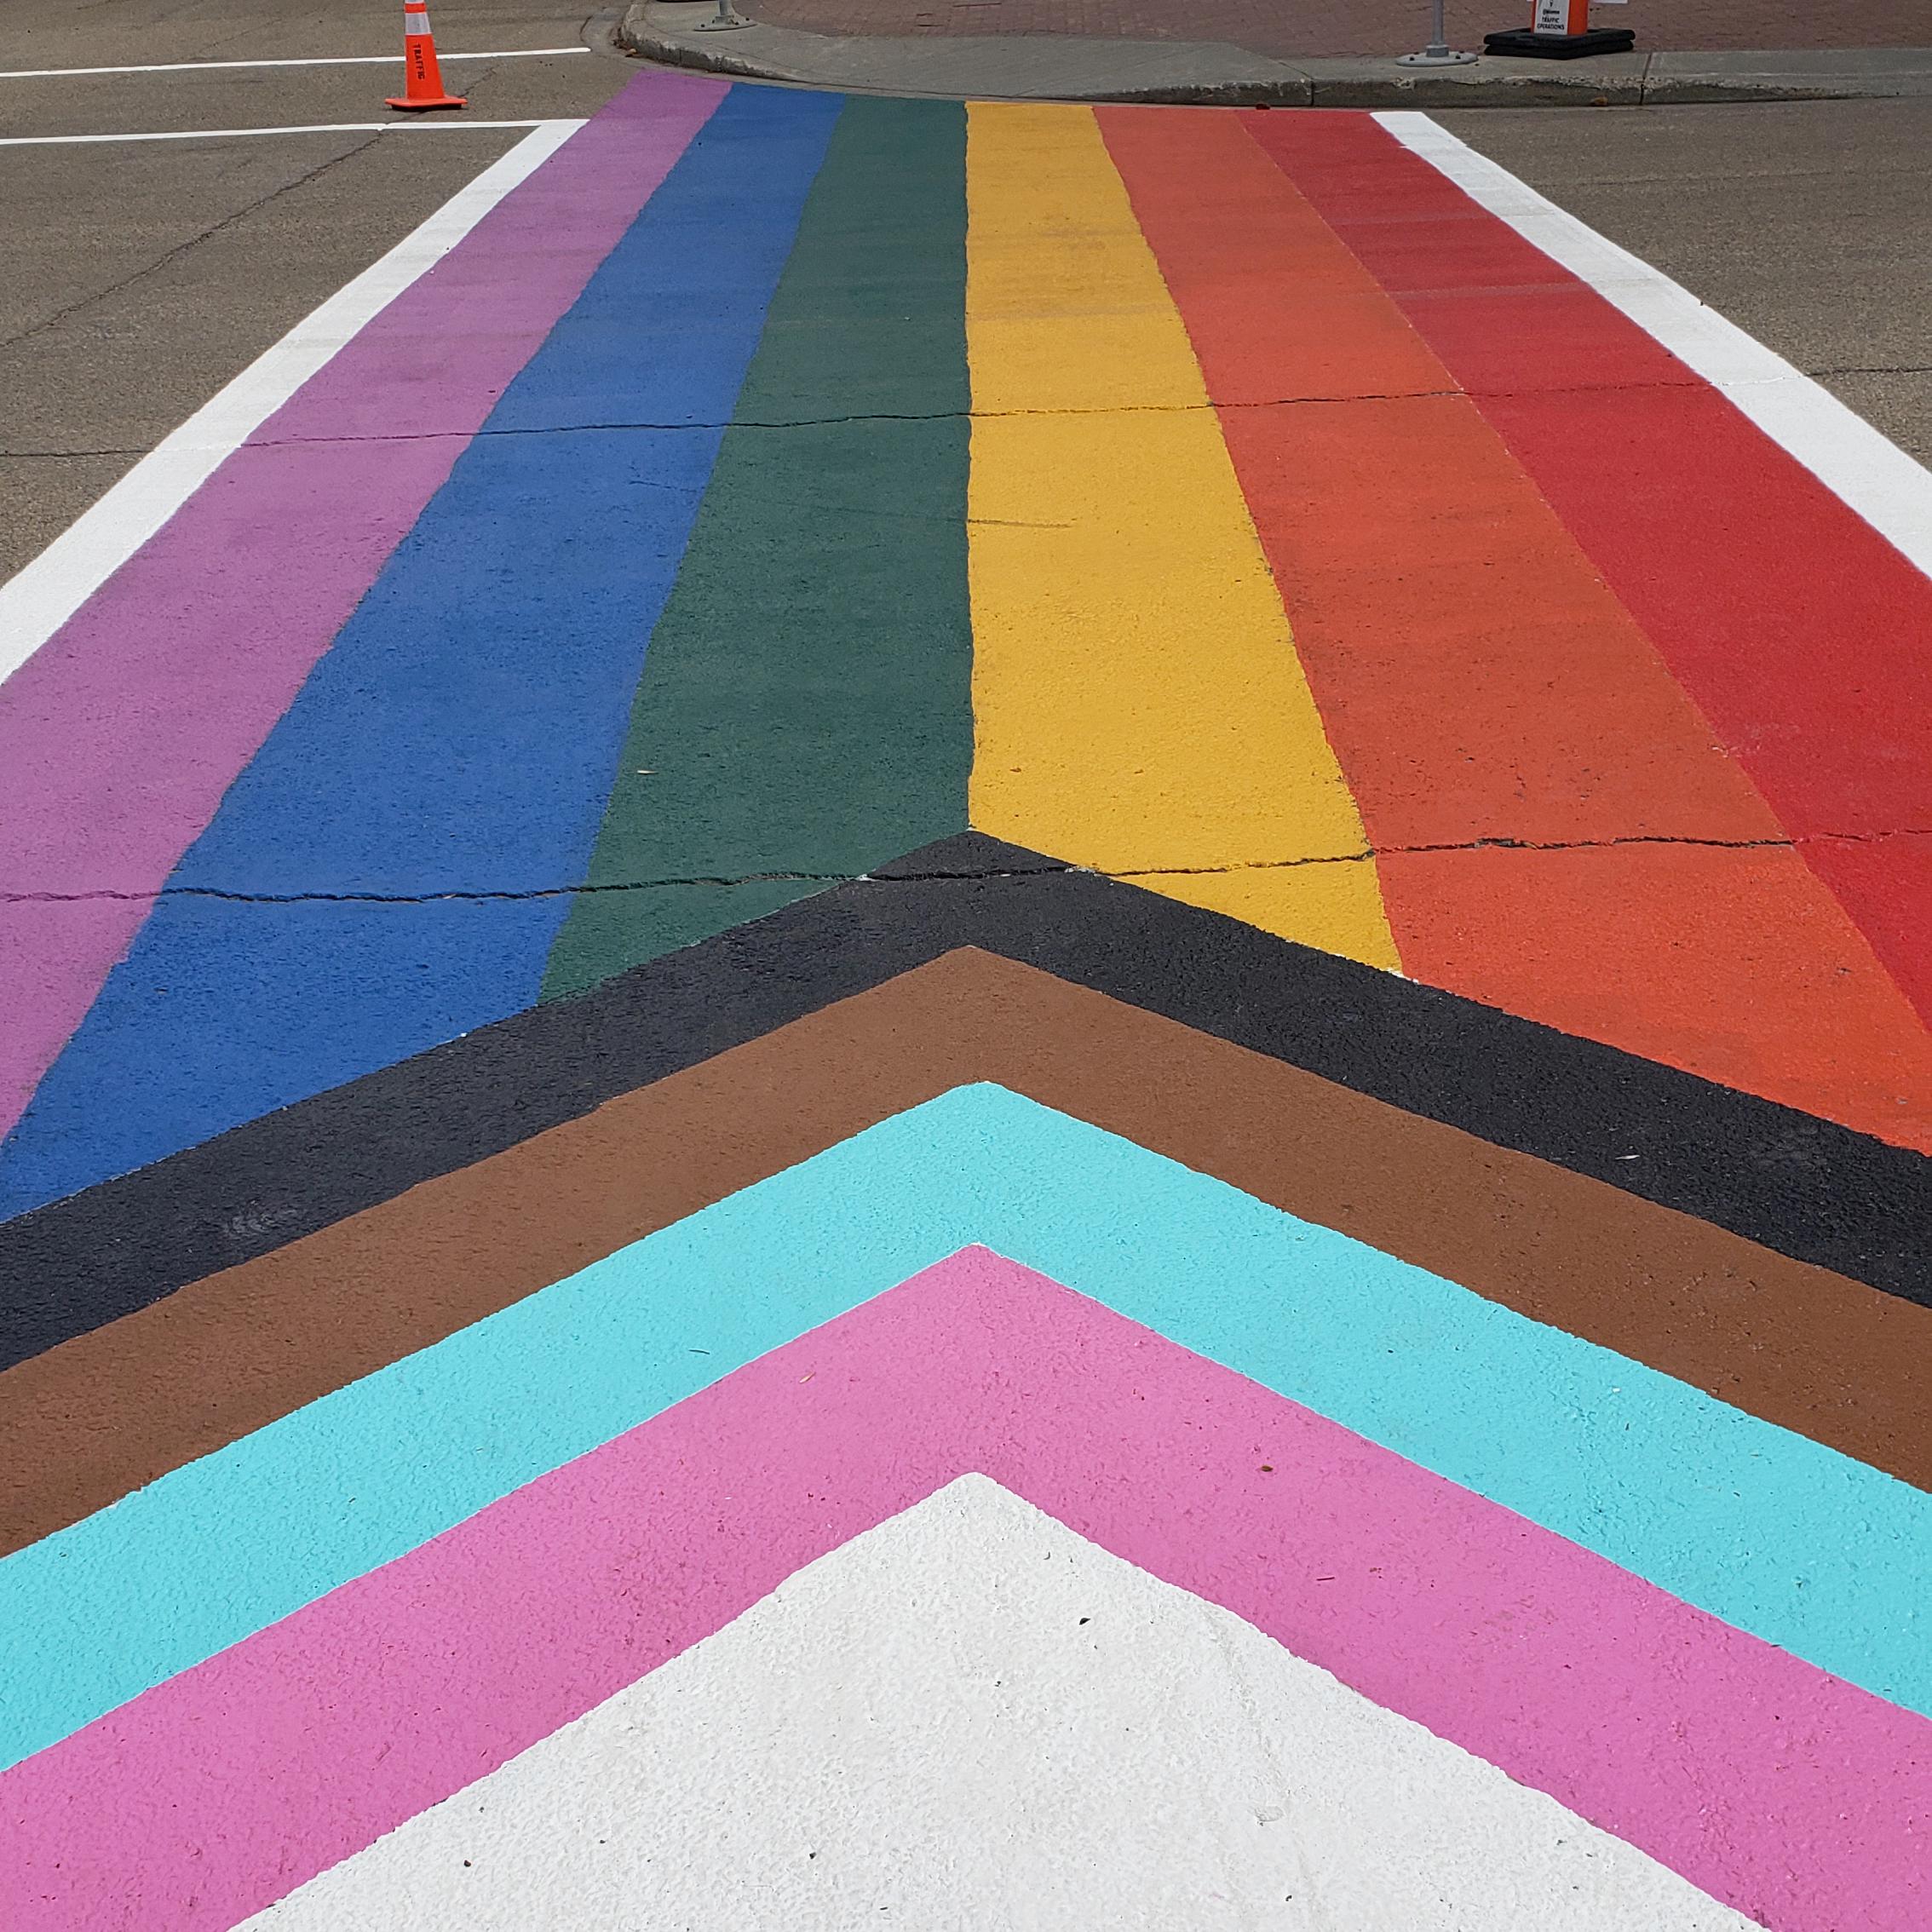 Pride Progress flag painted on a crosswalk